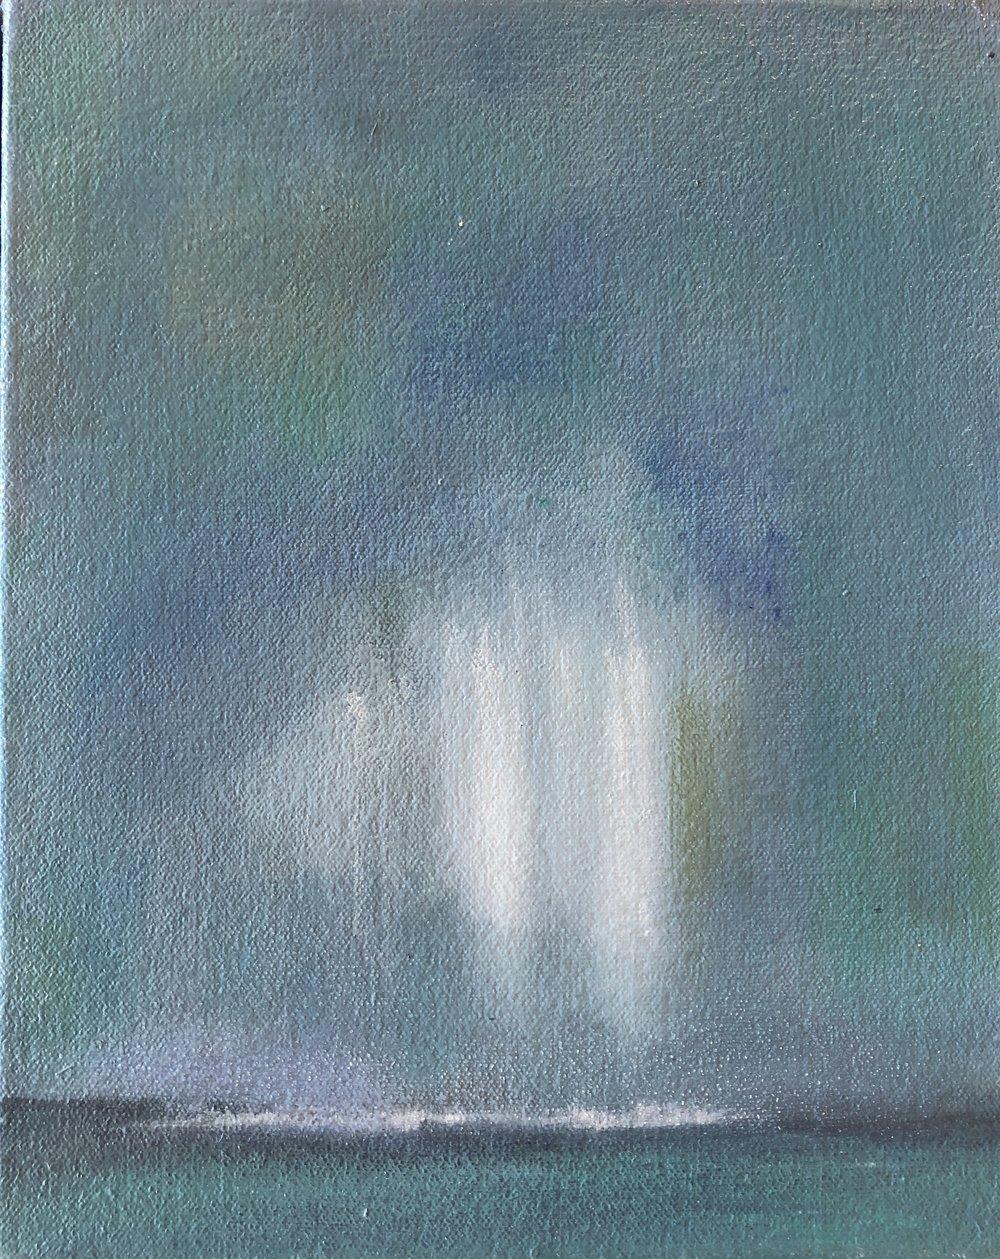 Heaven's Rain III, 2015